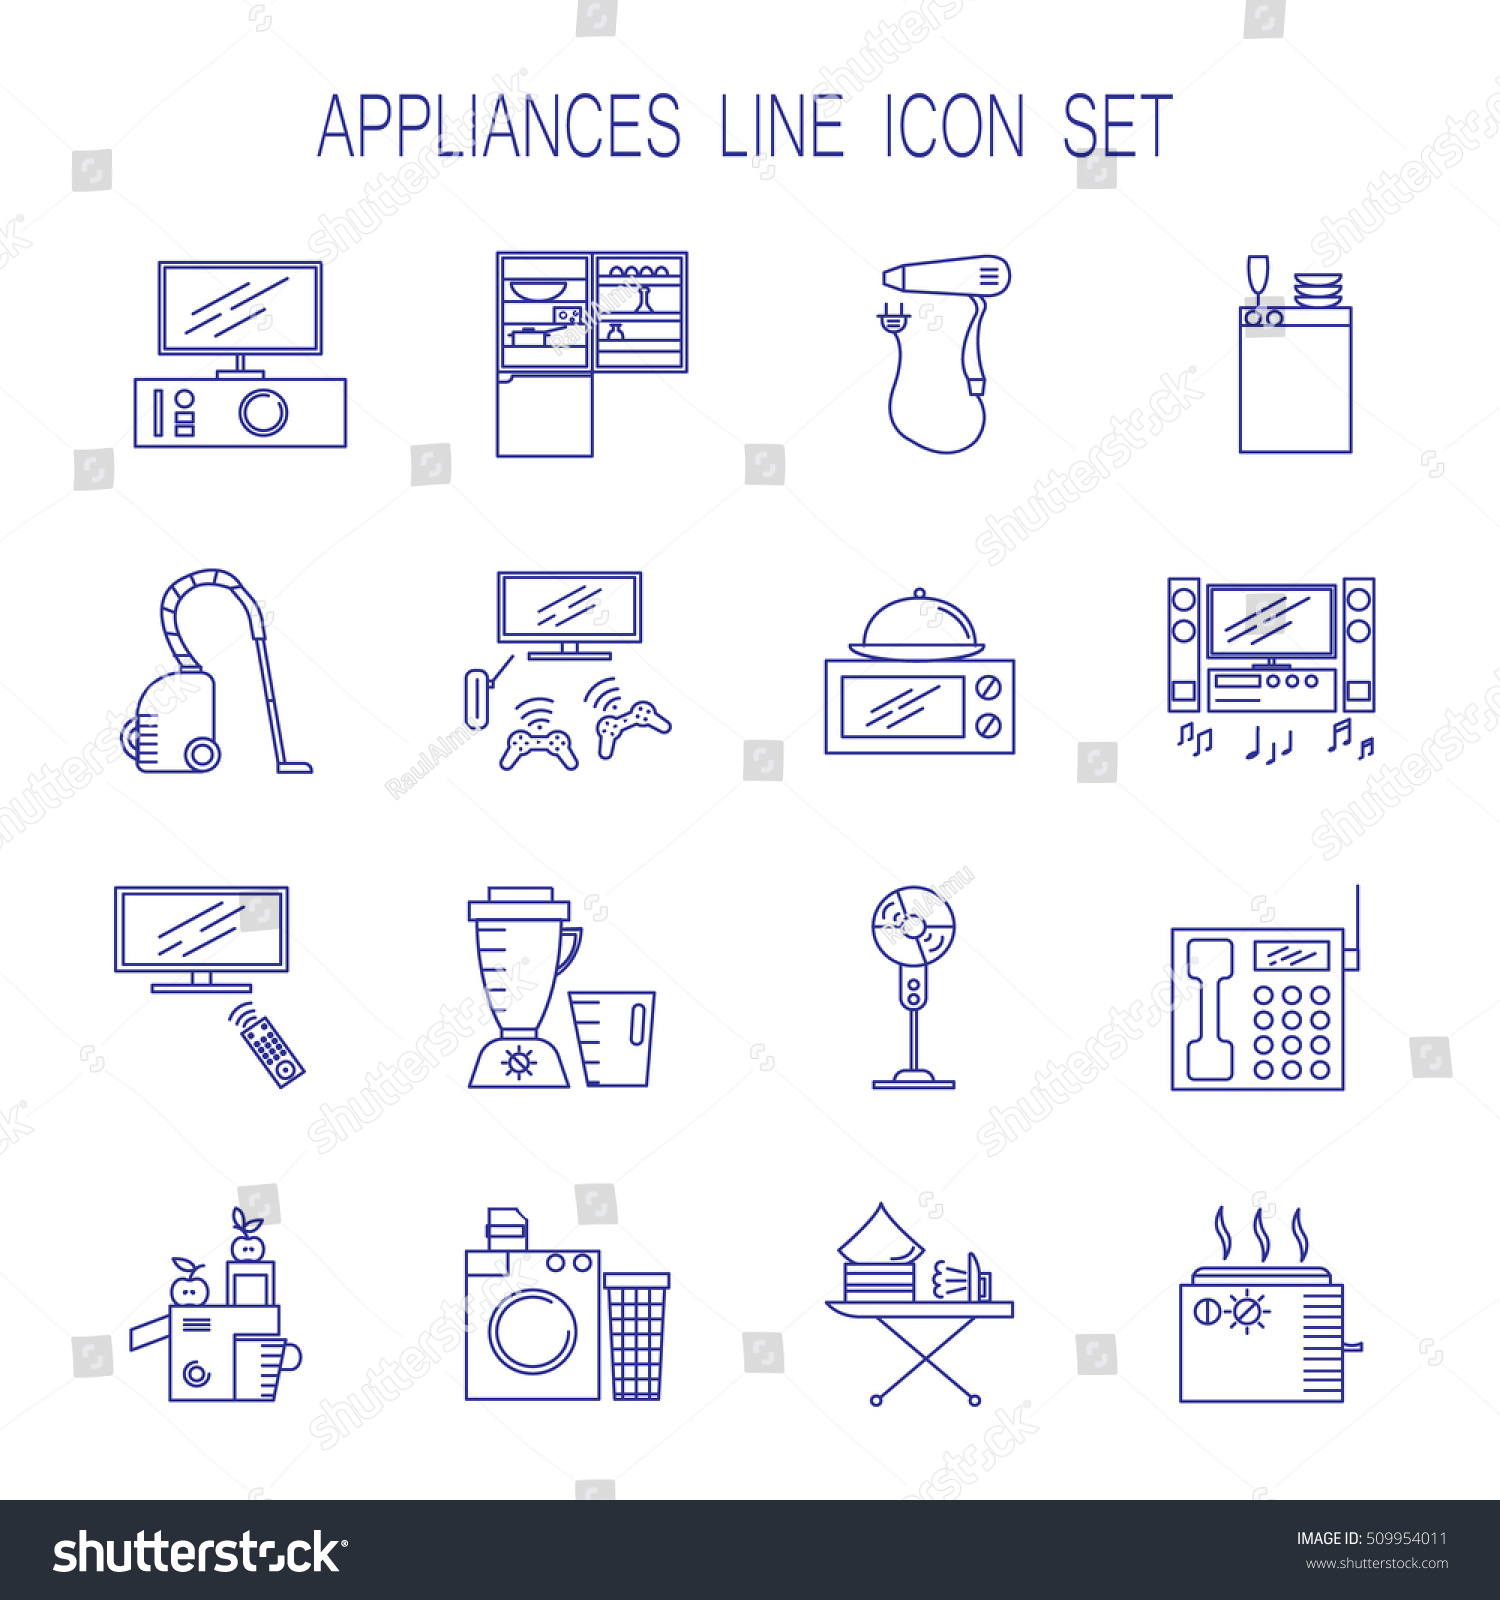 Appliances Line Icon Set Collection Vector Stock Vector Royalty